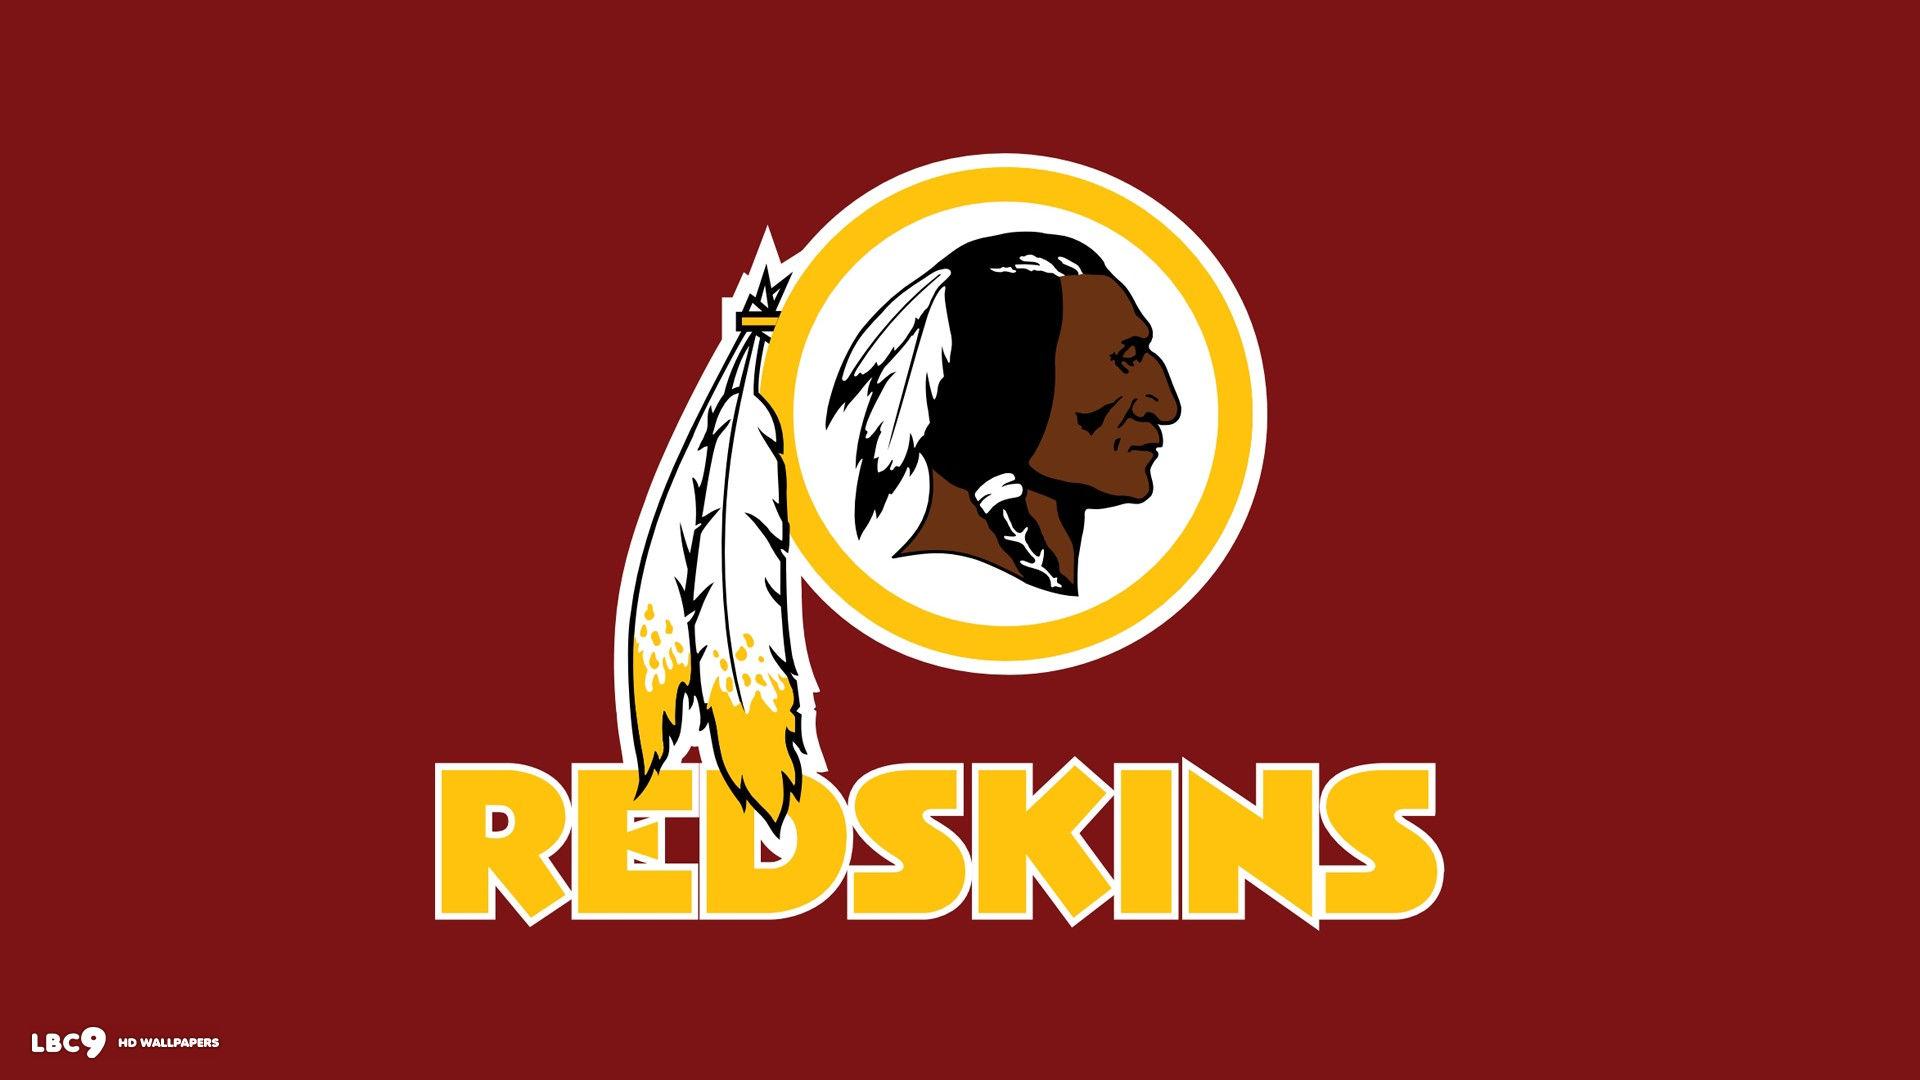 Come sarà il draft dei Washington Redskins?